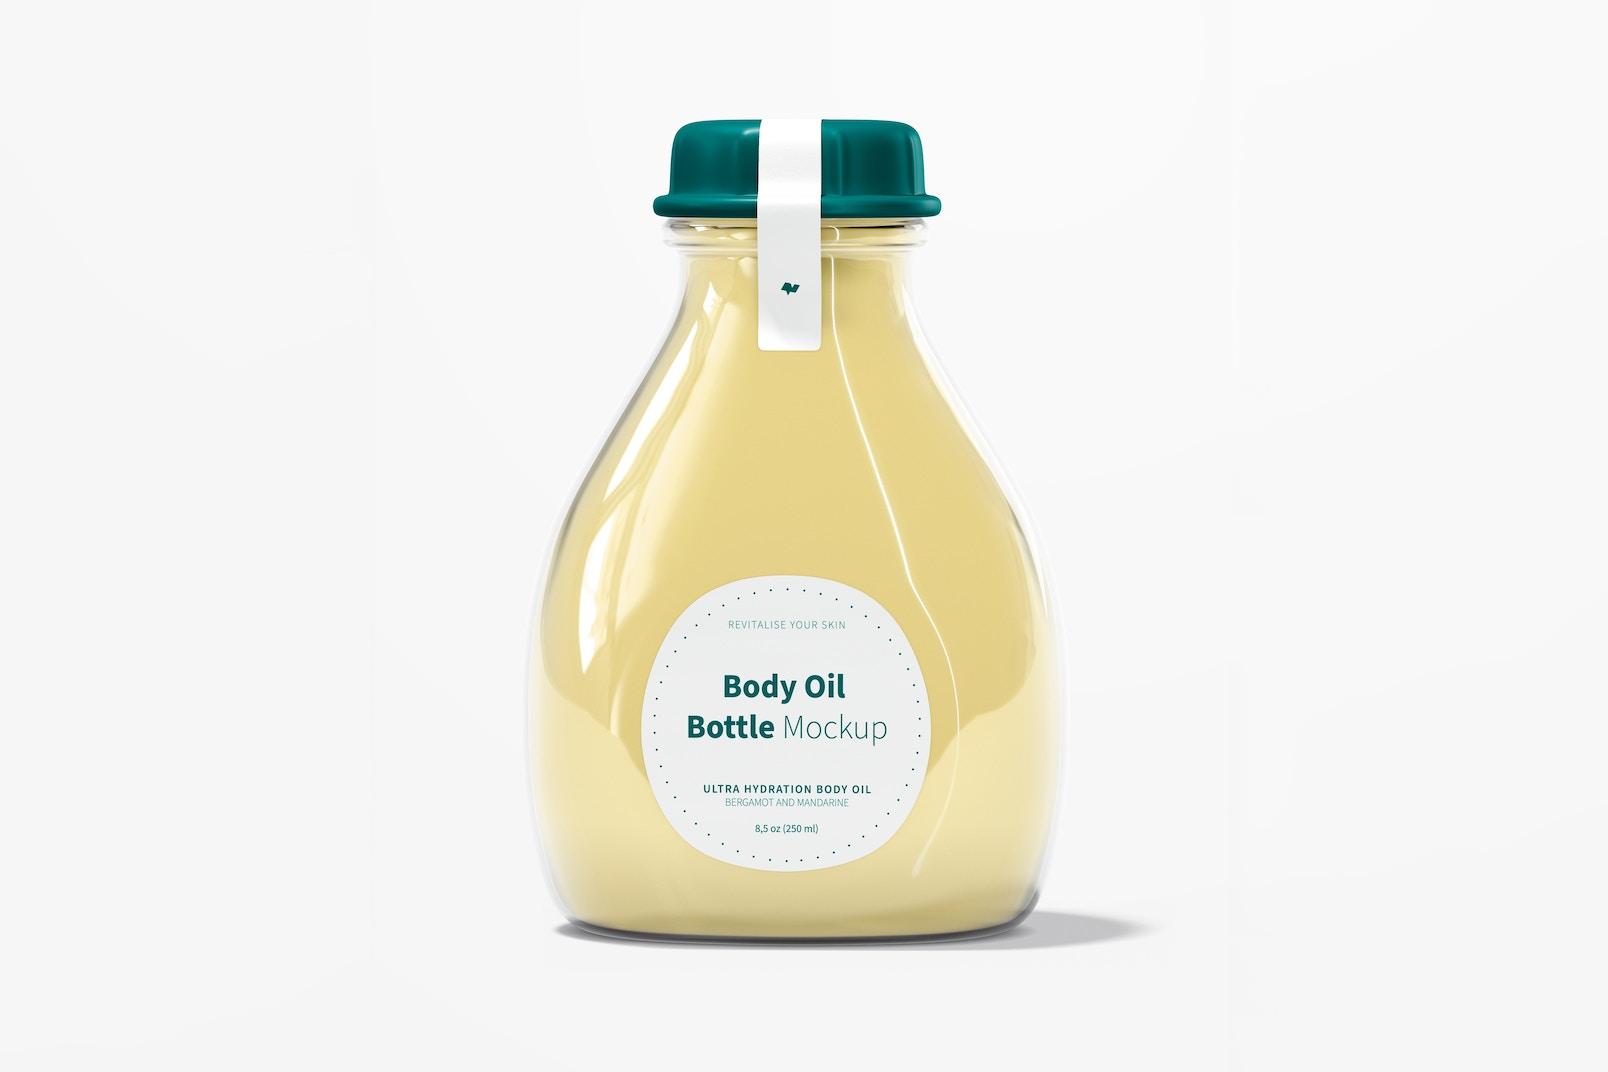 Body Oil Bottle Mockup, Front View